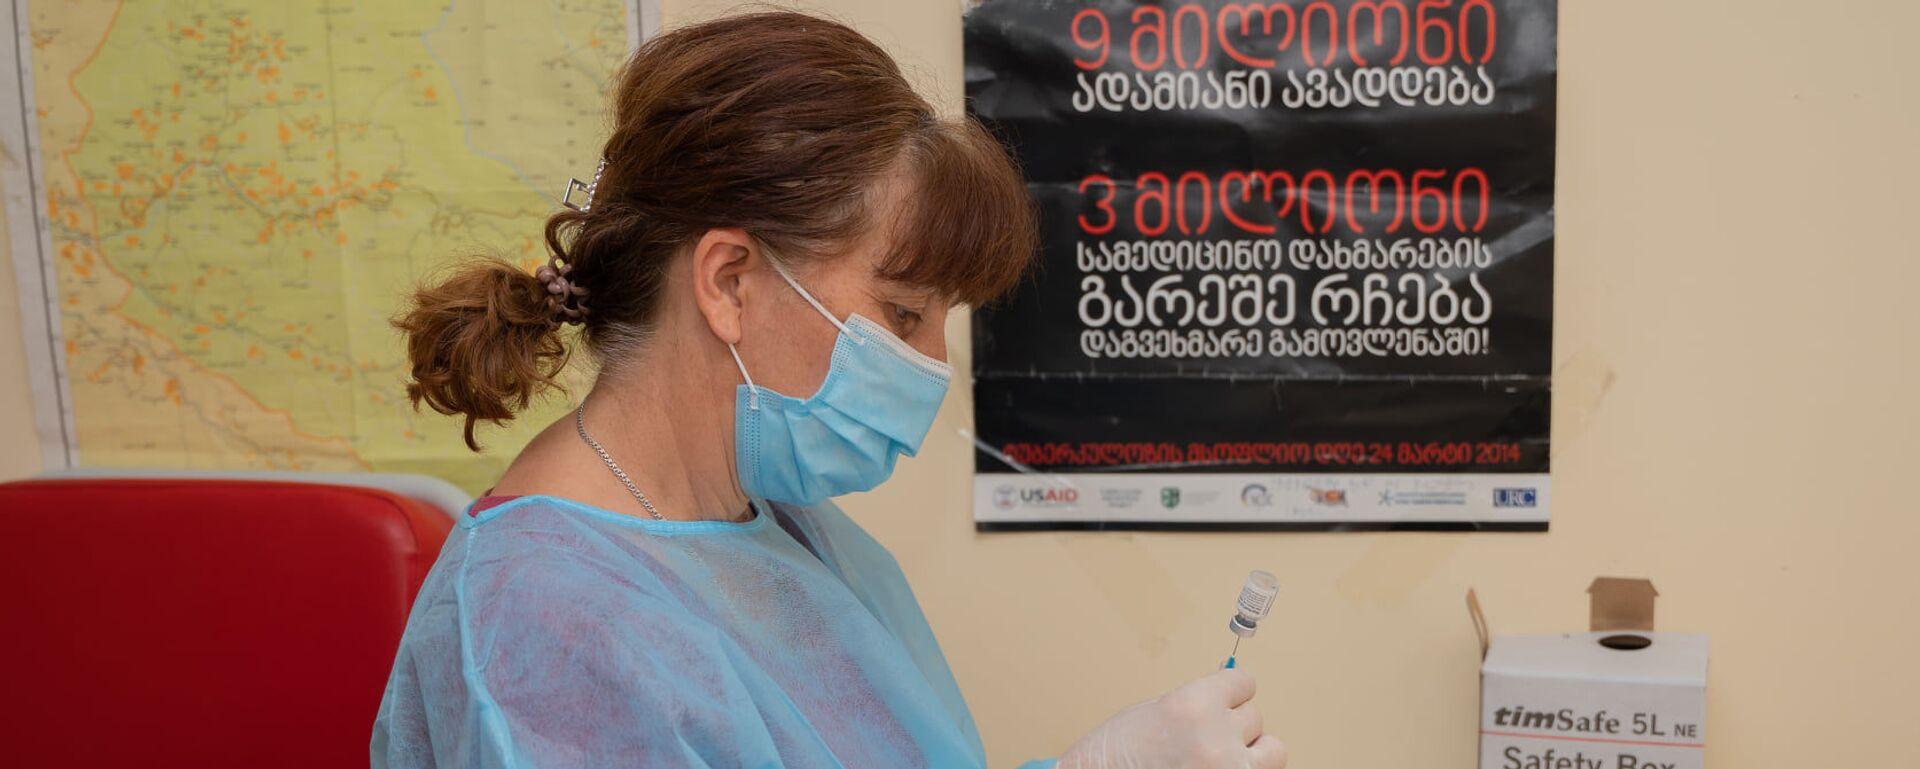 Эпидемия коронавируса - вакцинация населения в Аджарии - Sputnik Грузия, 1920, 06.10.2021